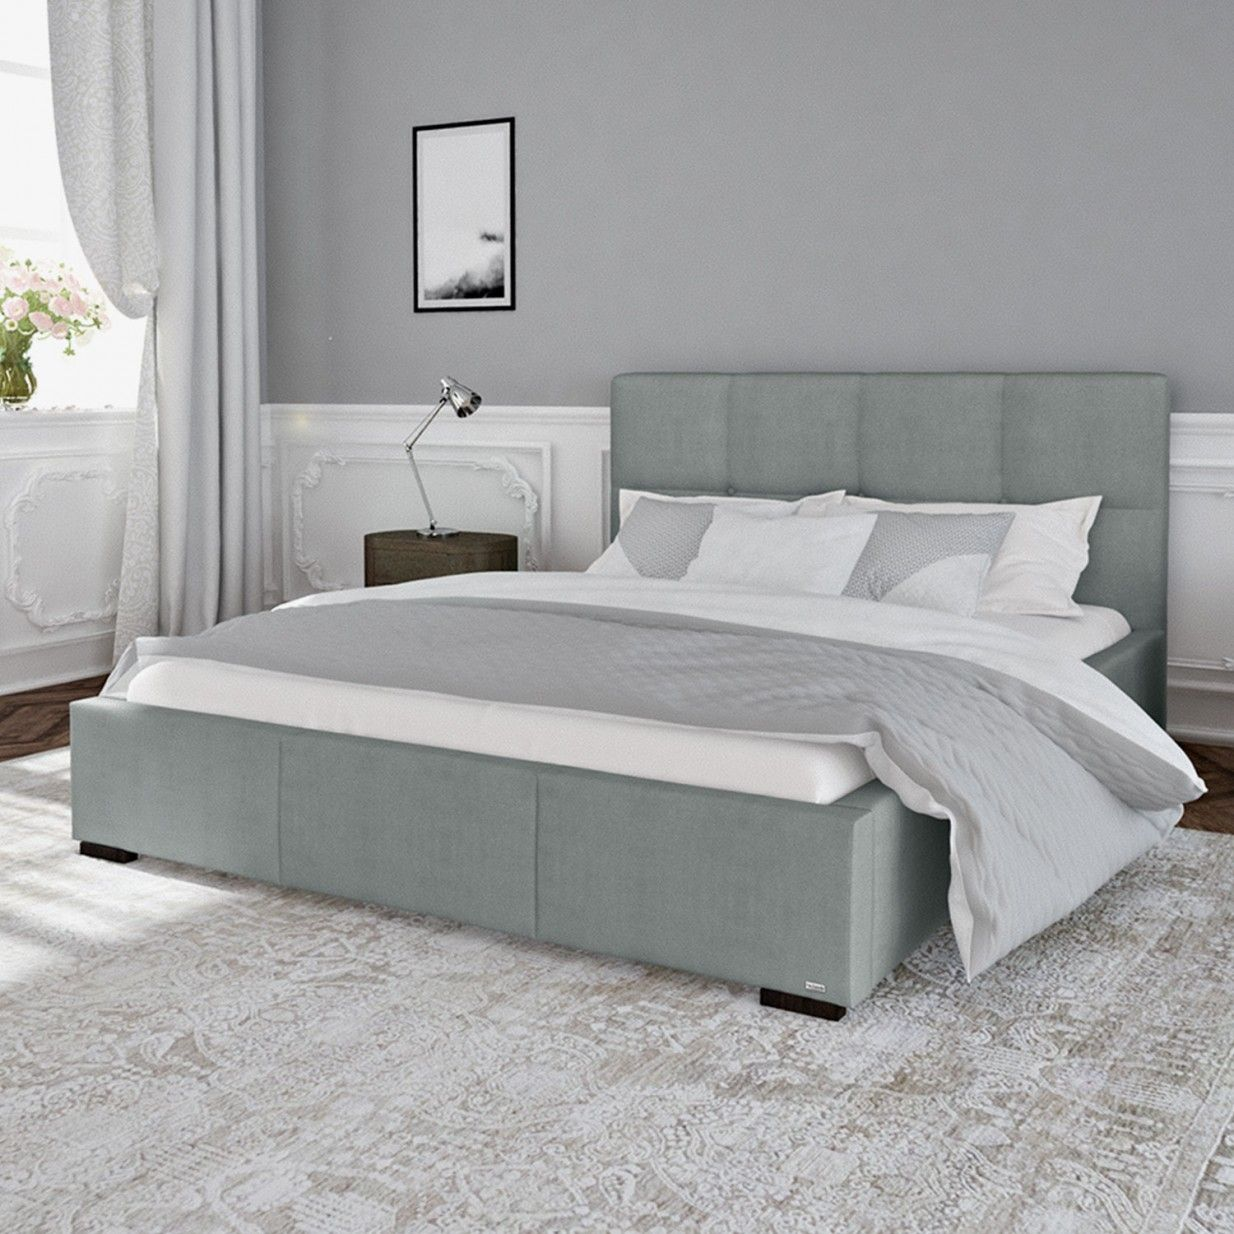 180x200 Fascination Bett Gr Night By Guy Laroche Home Home Bedroom Inspirations Bedroom Decor